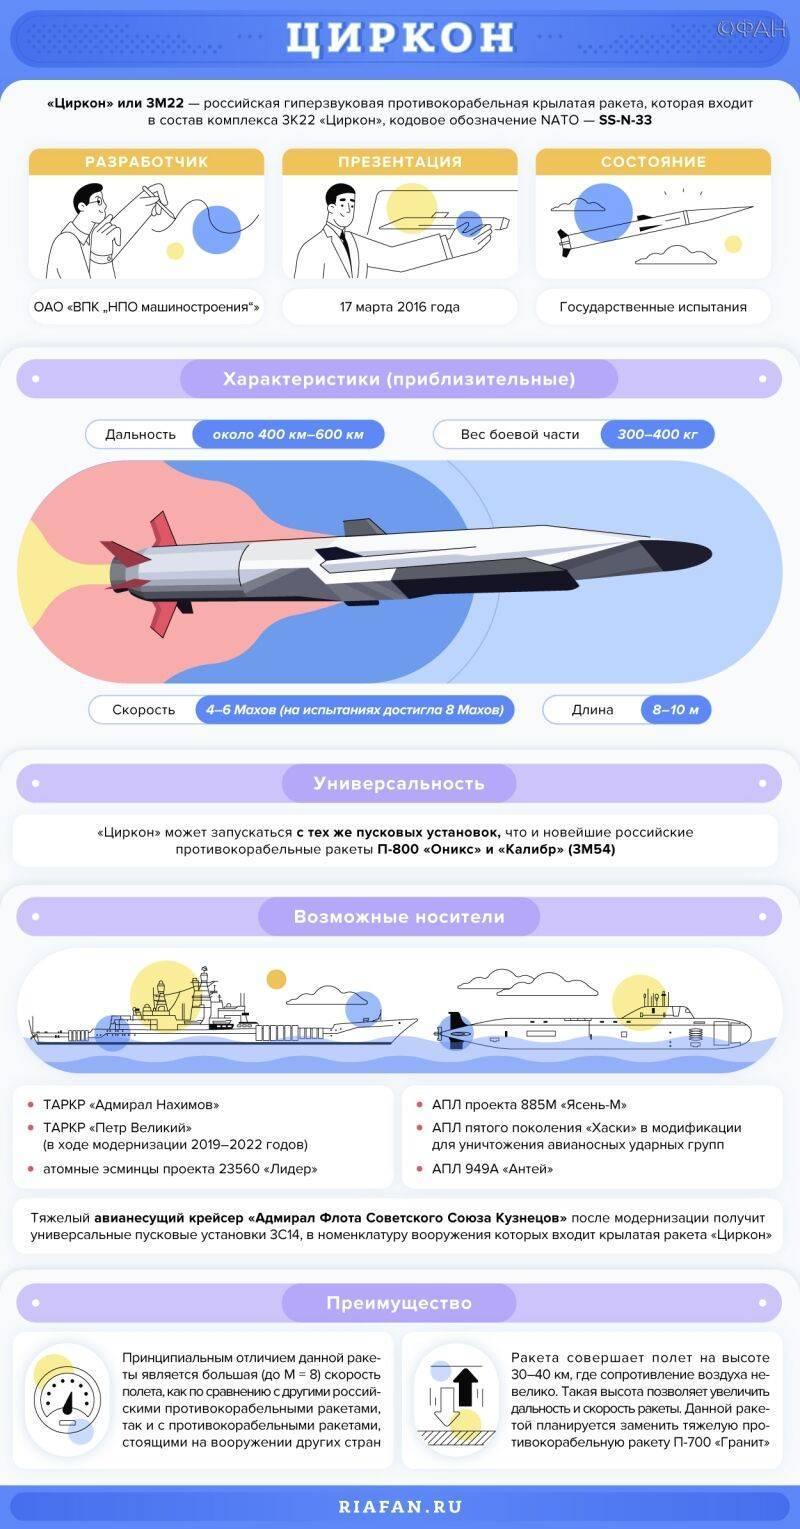 Ракета «Циркон» – новое слово в войне на море